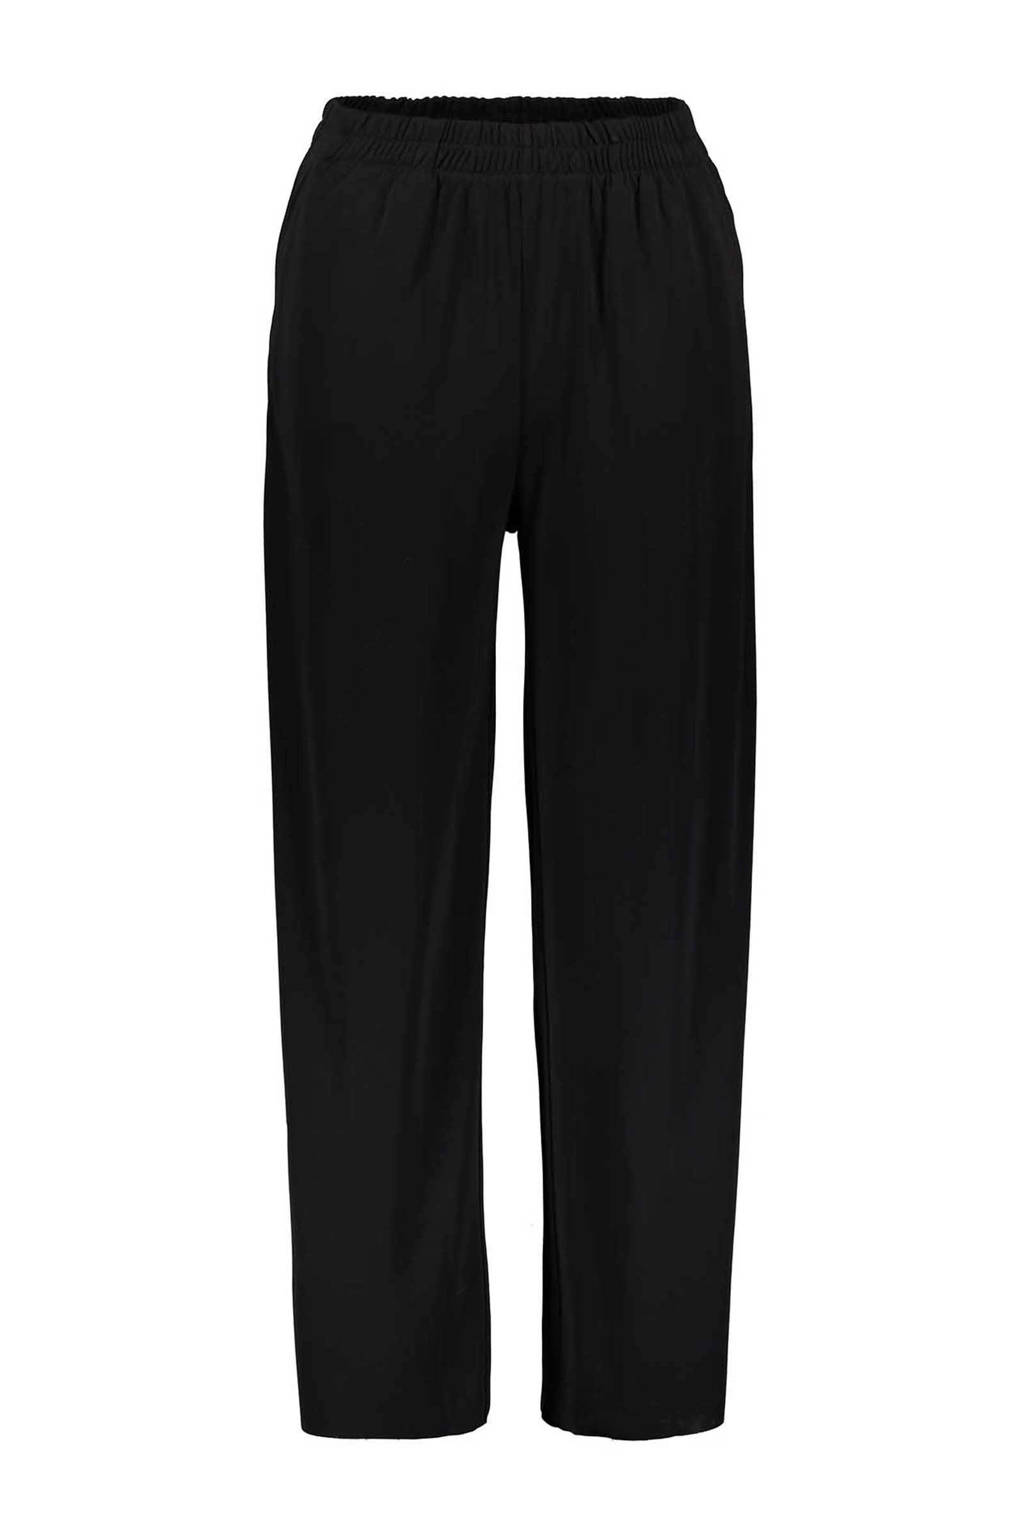 Sissy-Boy palazzo broek zwart, Zwart